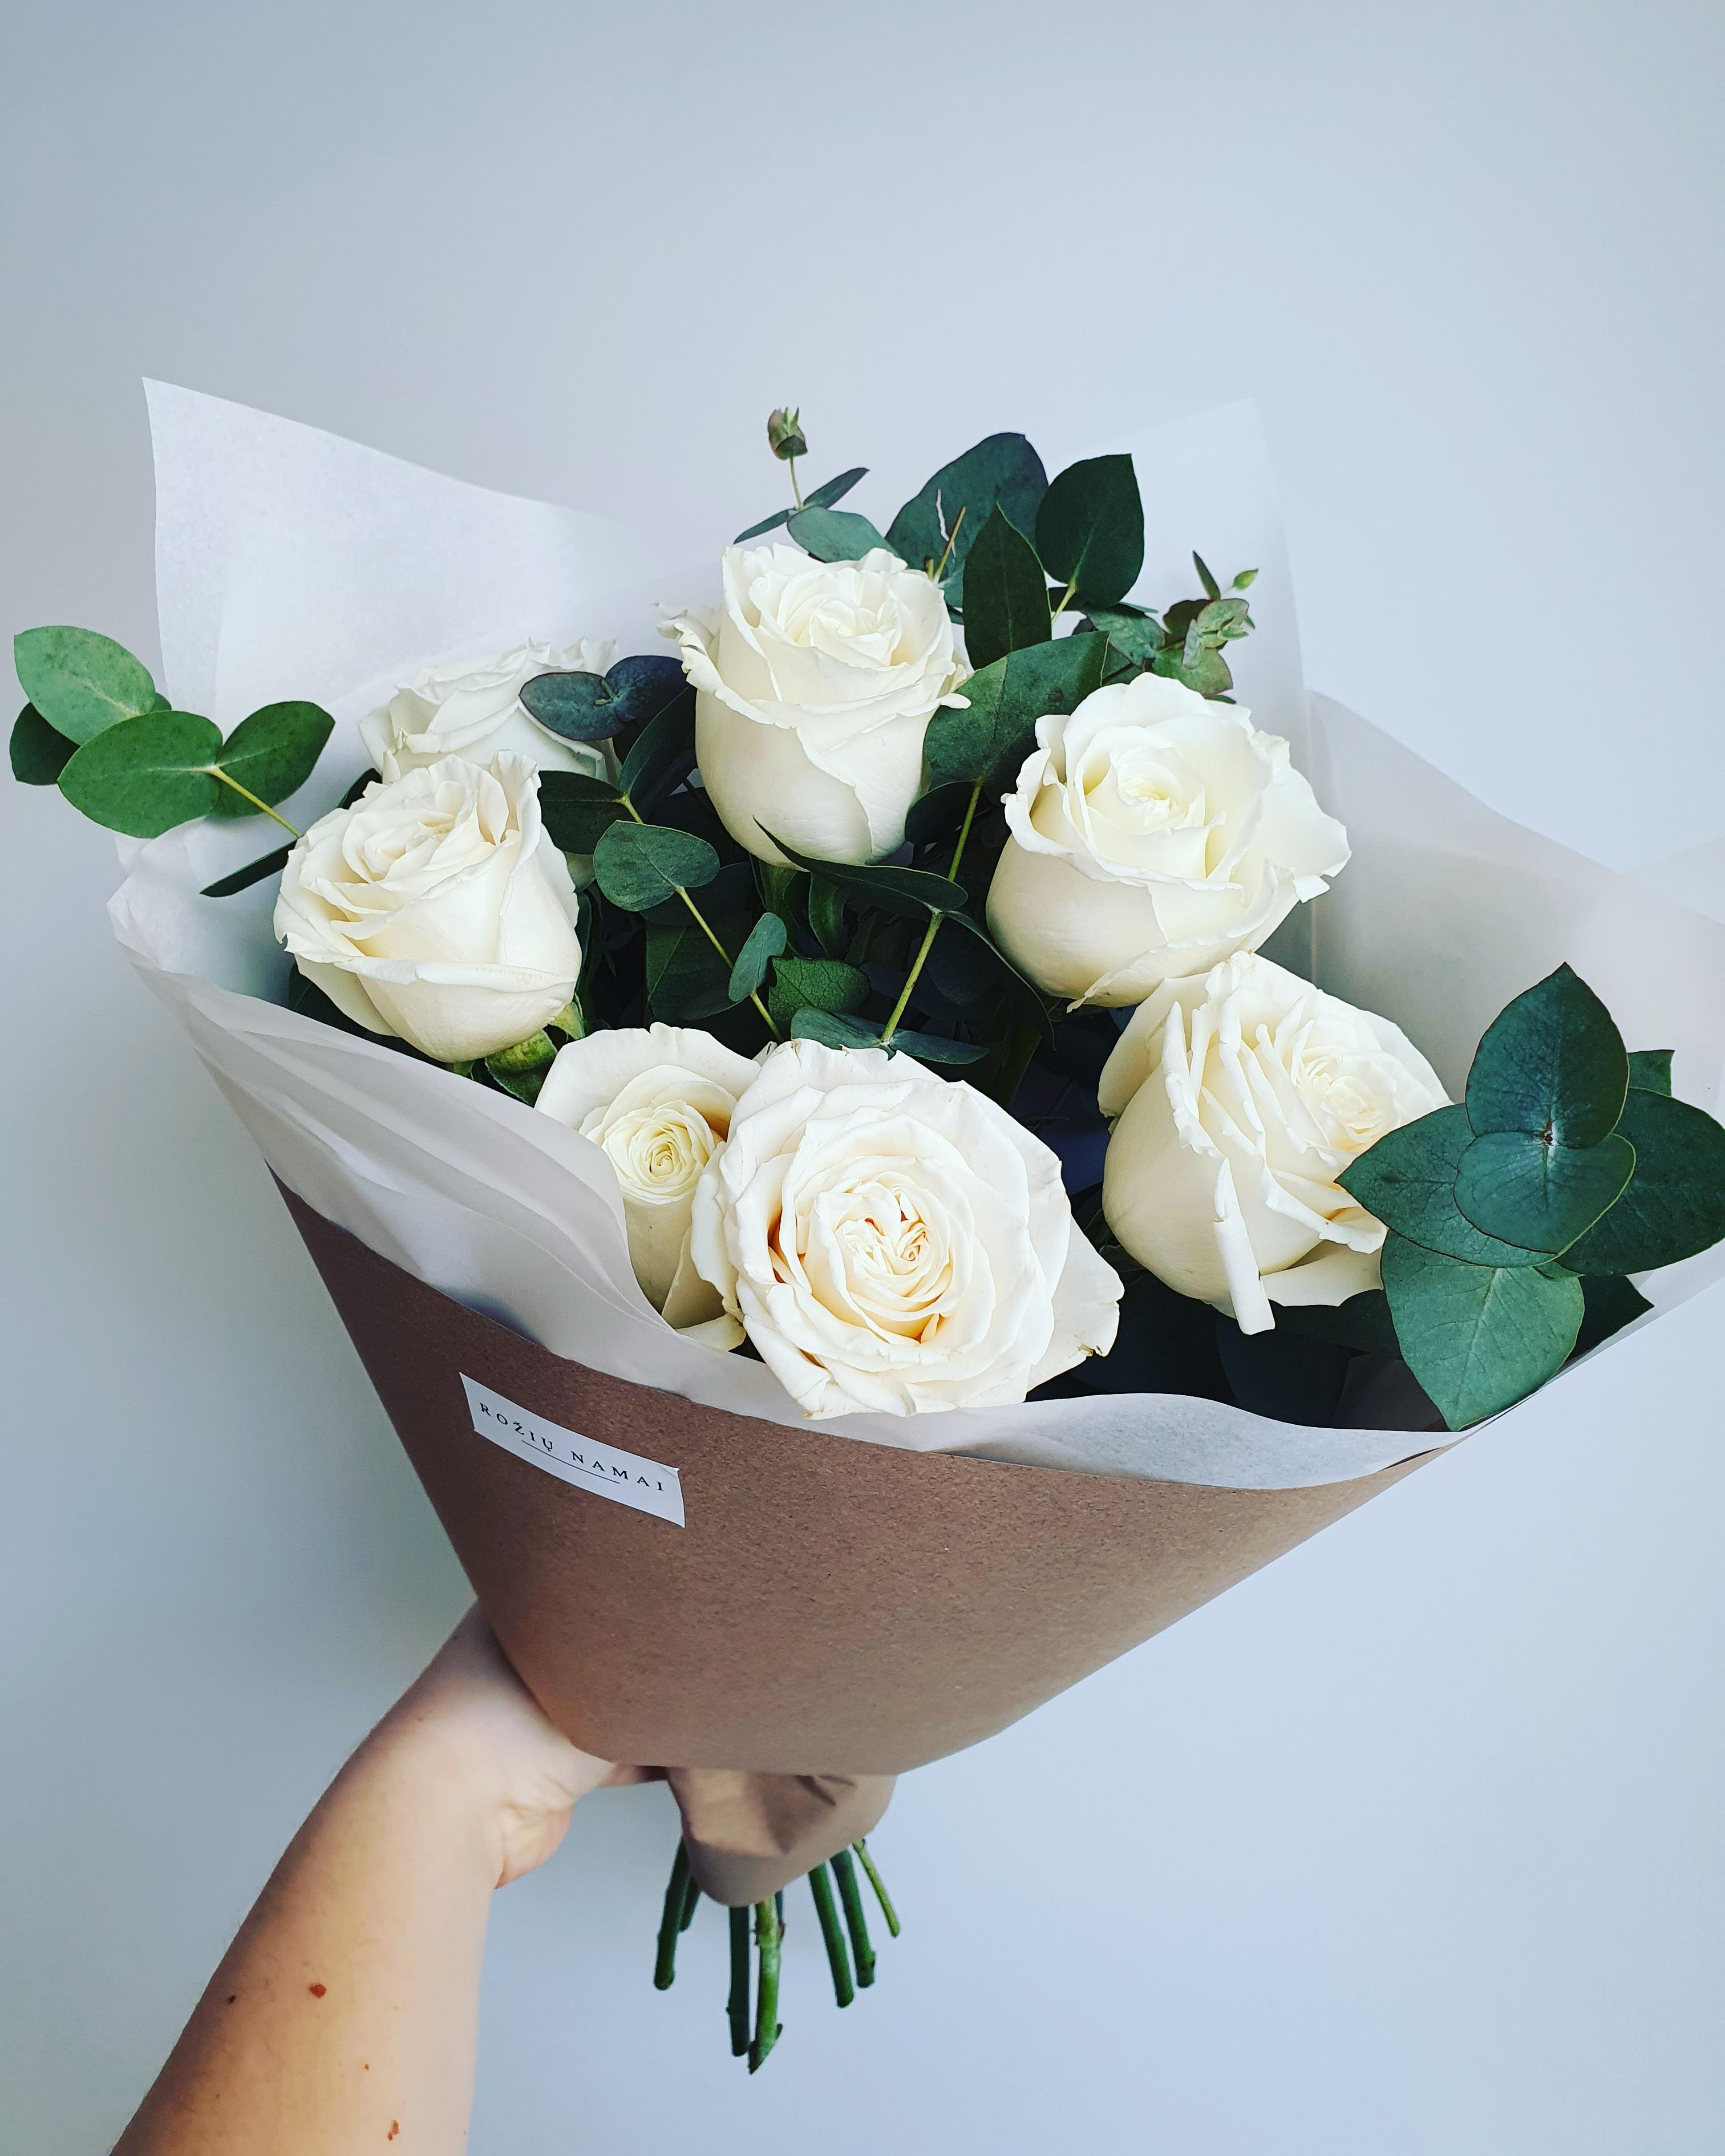 Baltos rožės 9 vnt.